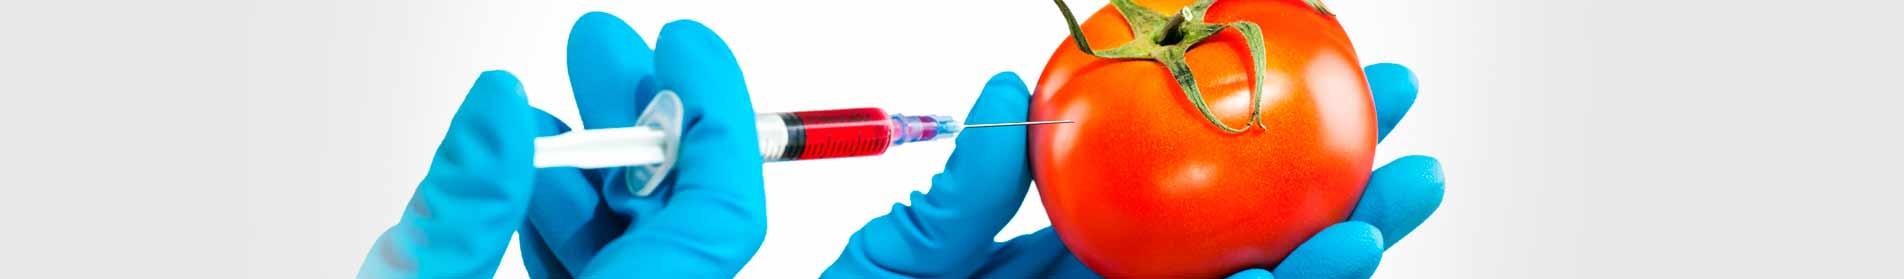 Mundiquímica | aditivos alimentares